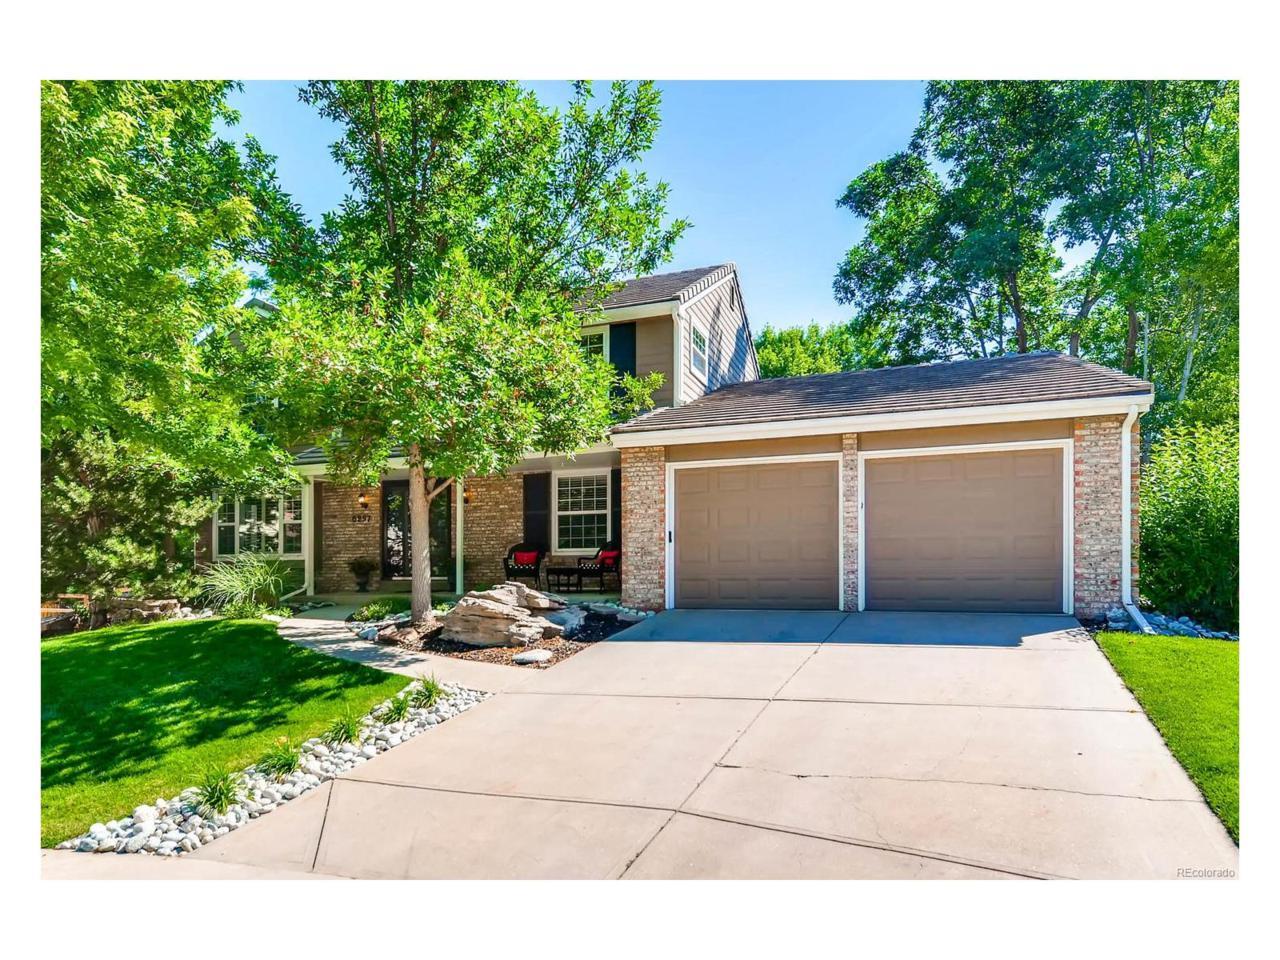 6297 E Jamison Drive, Centennial, CO 80112 (MLS #7246084) :: 8z Real Estate